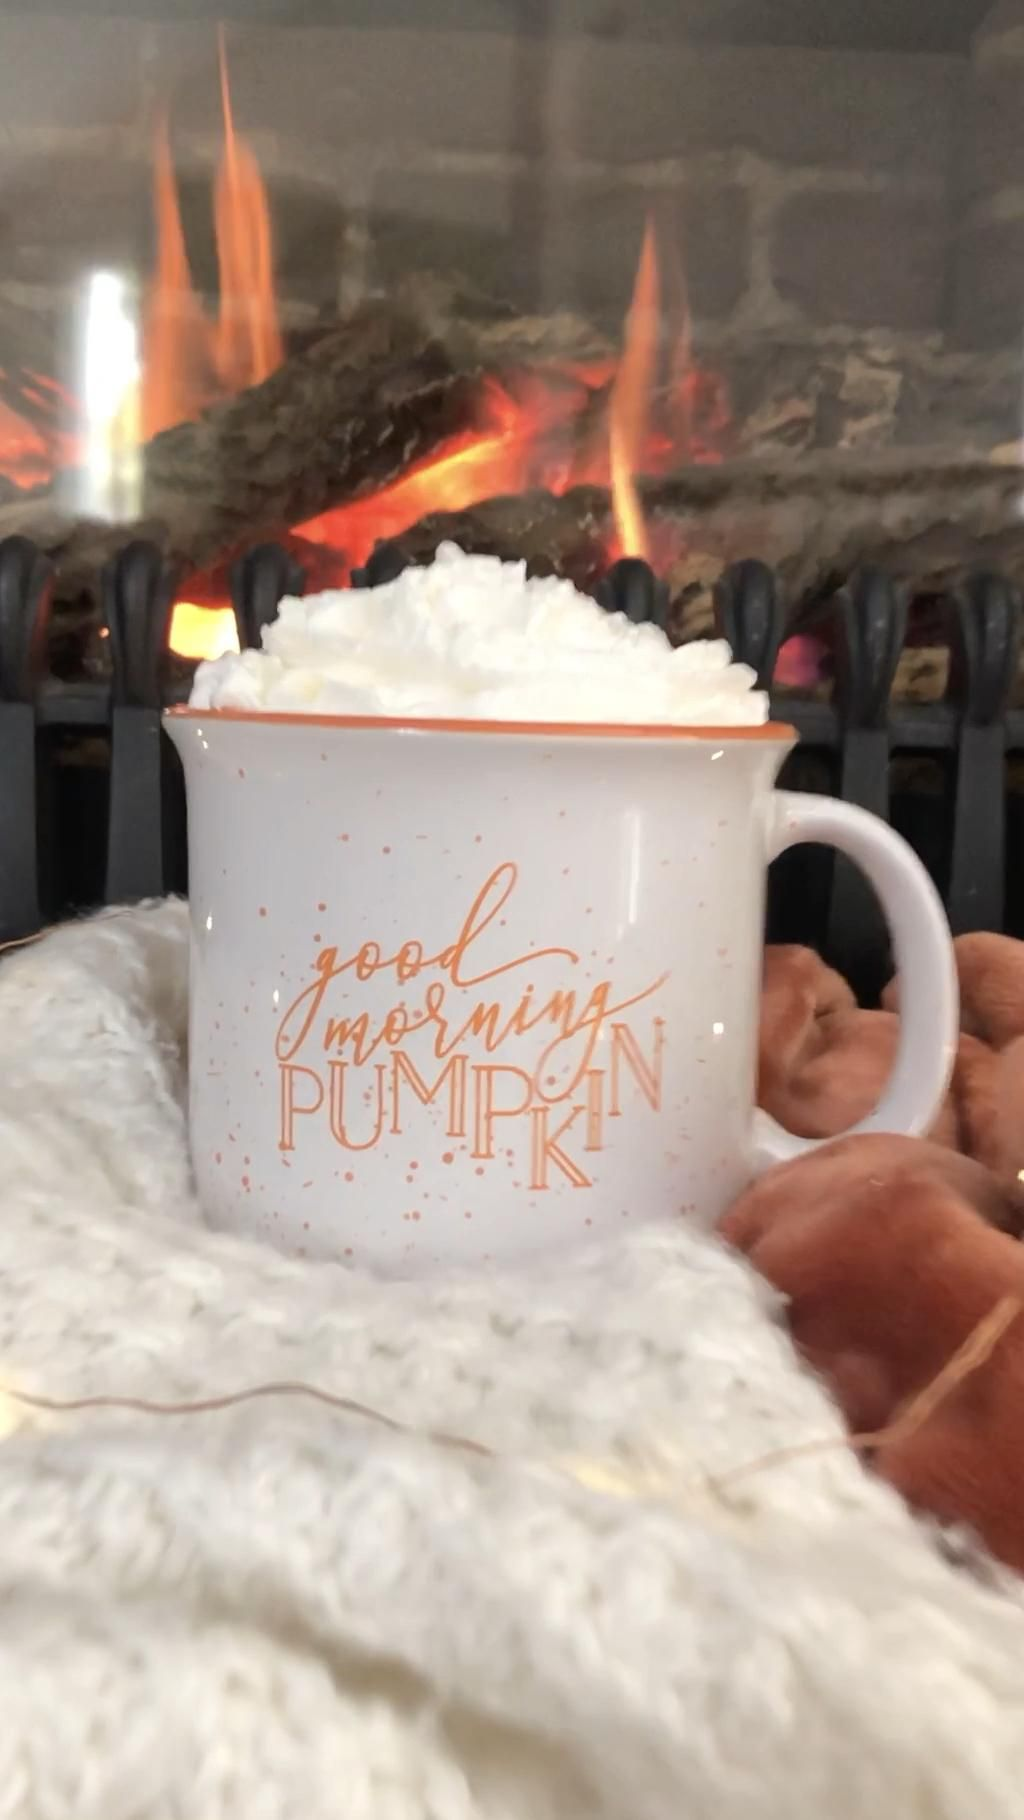 Good Morning Pumpkin Campfire Mug - White Version